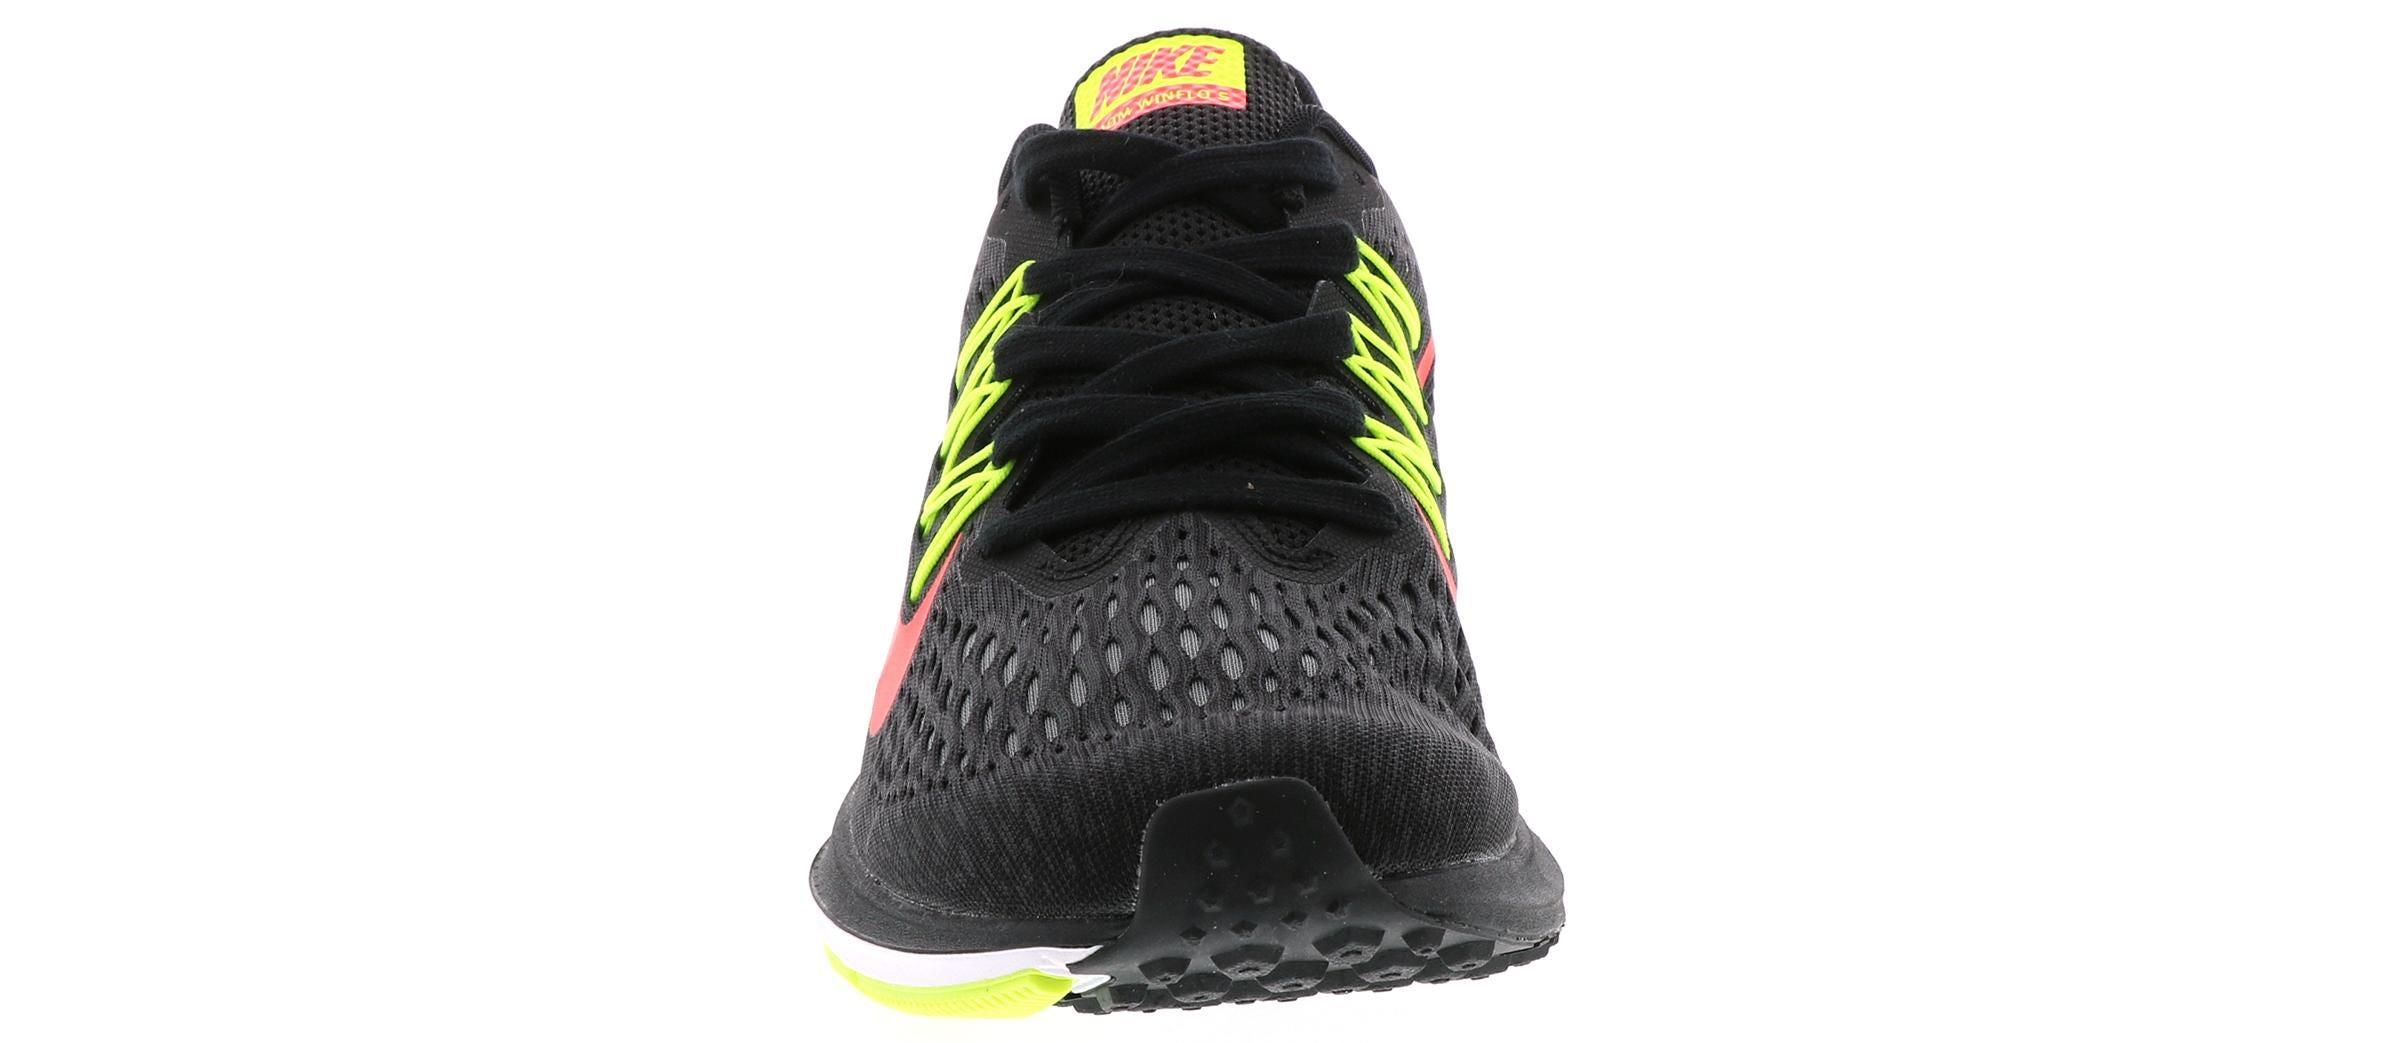 sale retailer d5790 56e98 Men's Nike Air Zoom Winflo 5